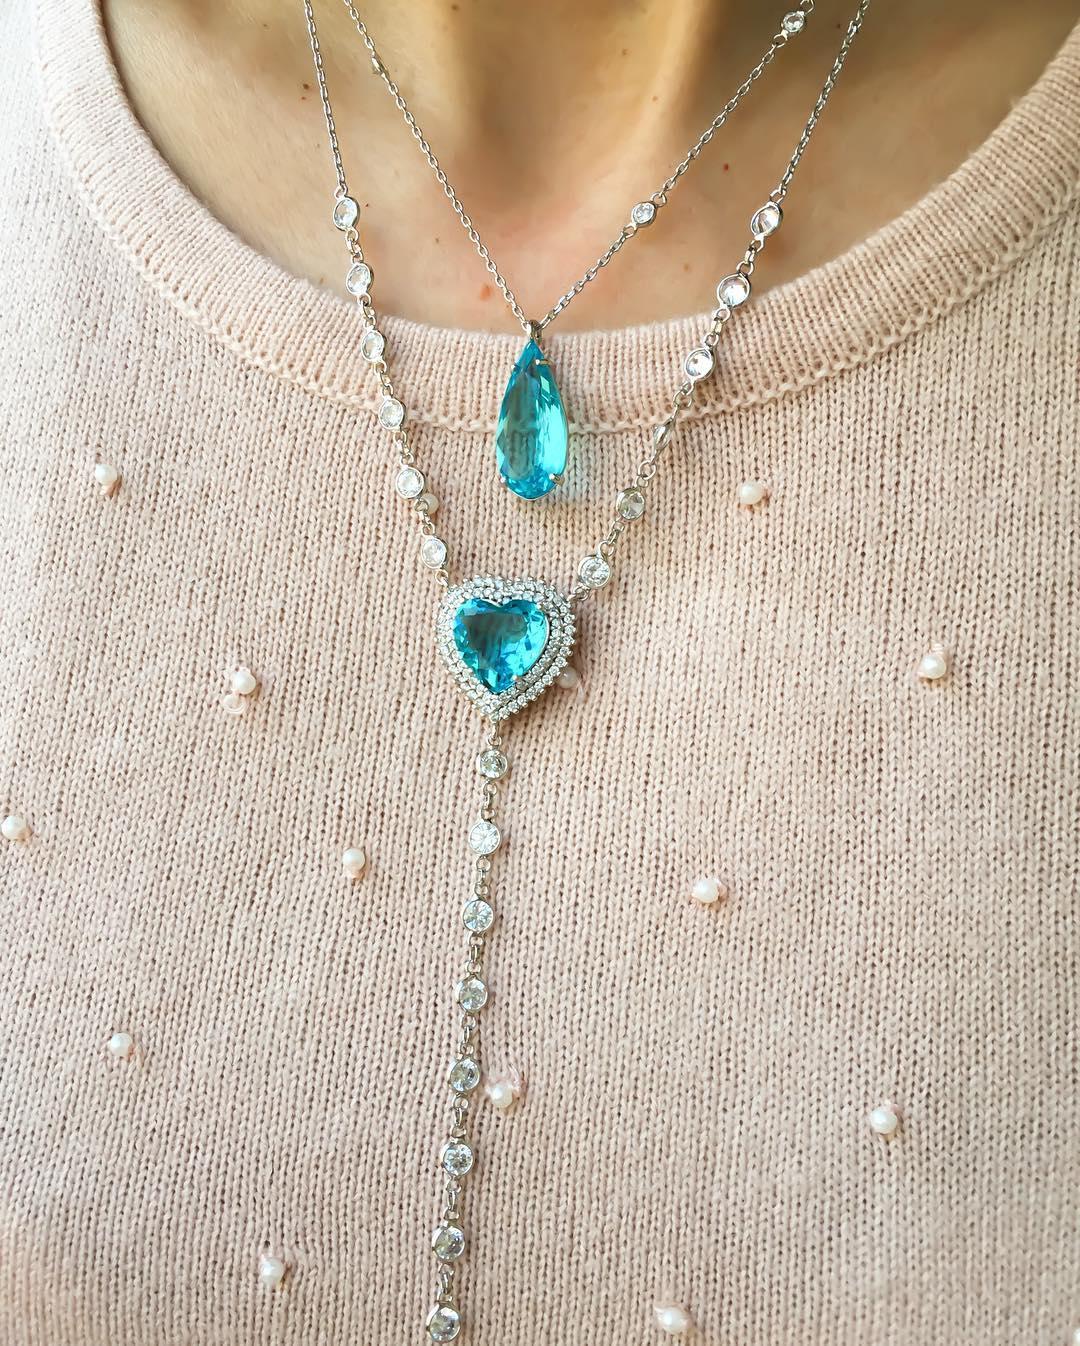 Como combinar dois colares tonalidade da pedra